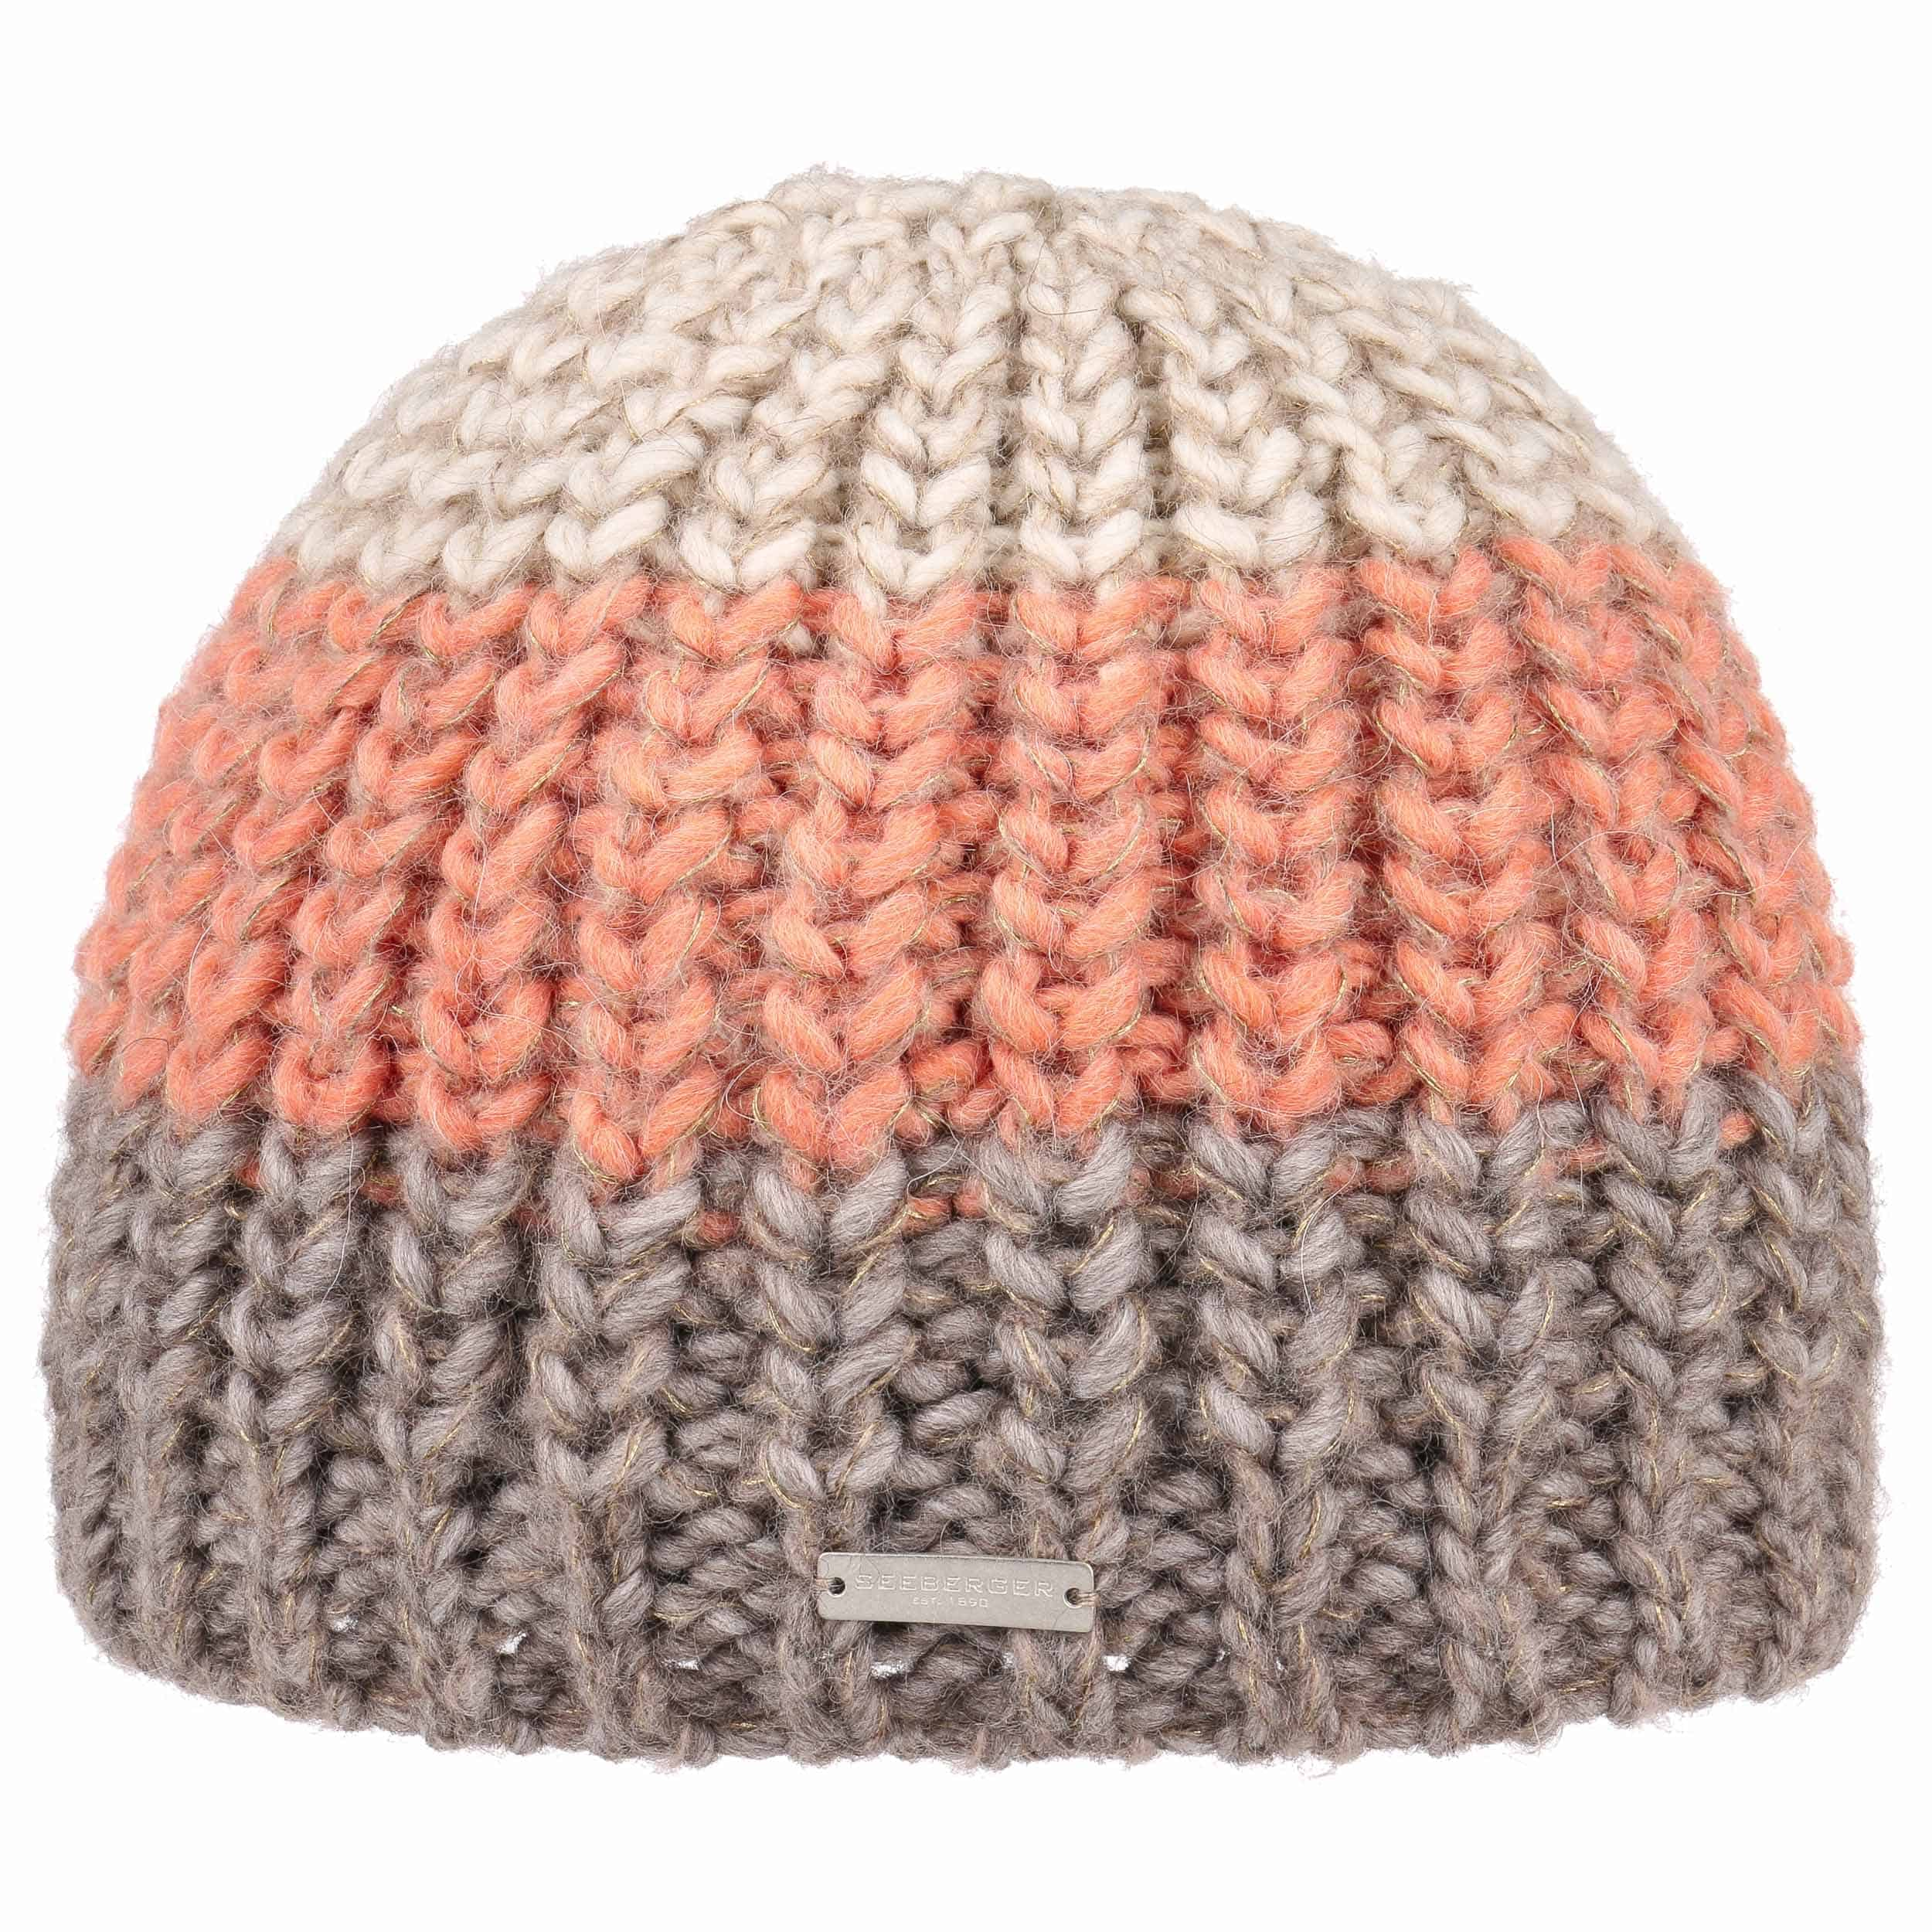 ... Alpaca Mohair Lurex Beanie Hat by Seeberger - apricot 3 ... 6d2b282408f